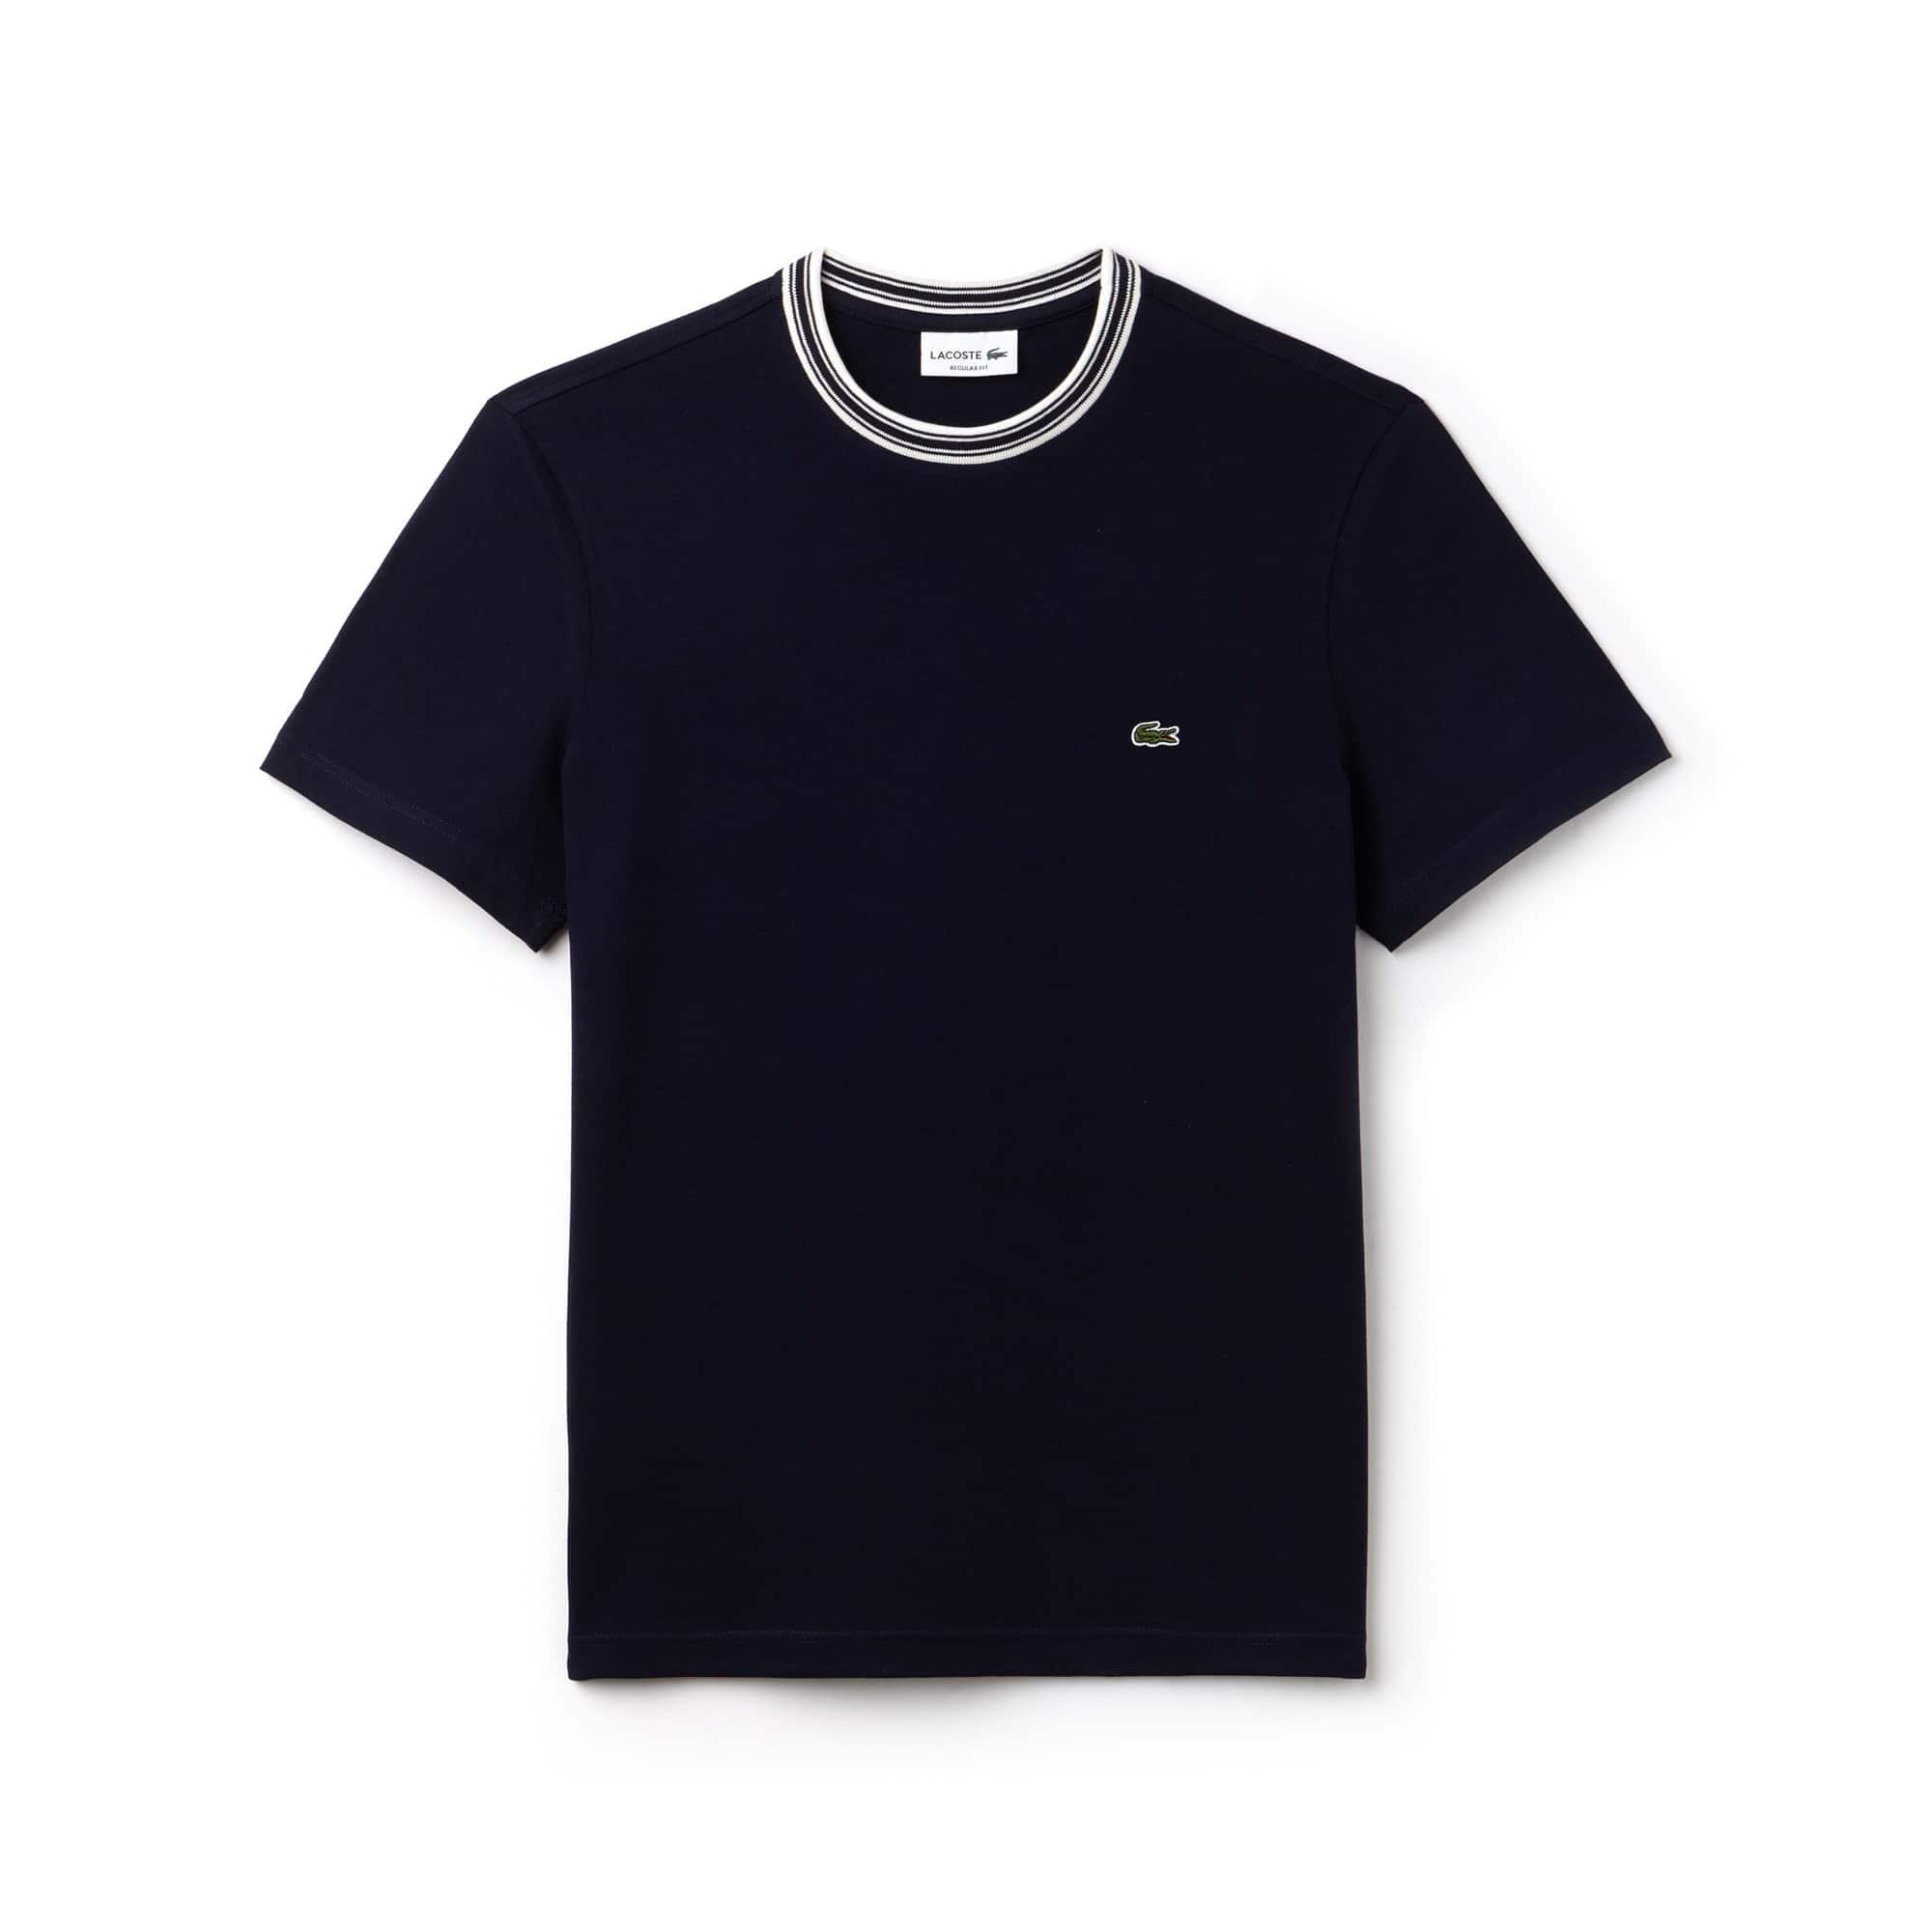 Men's Striped Crew Neck Cotton Jersey T-shirt